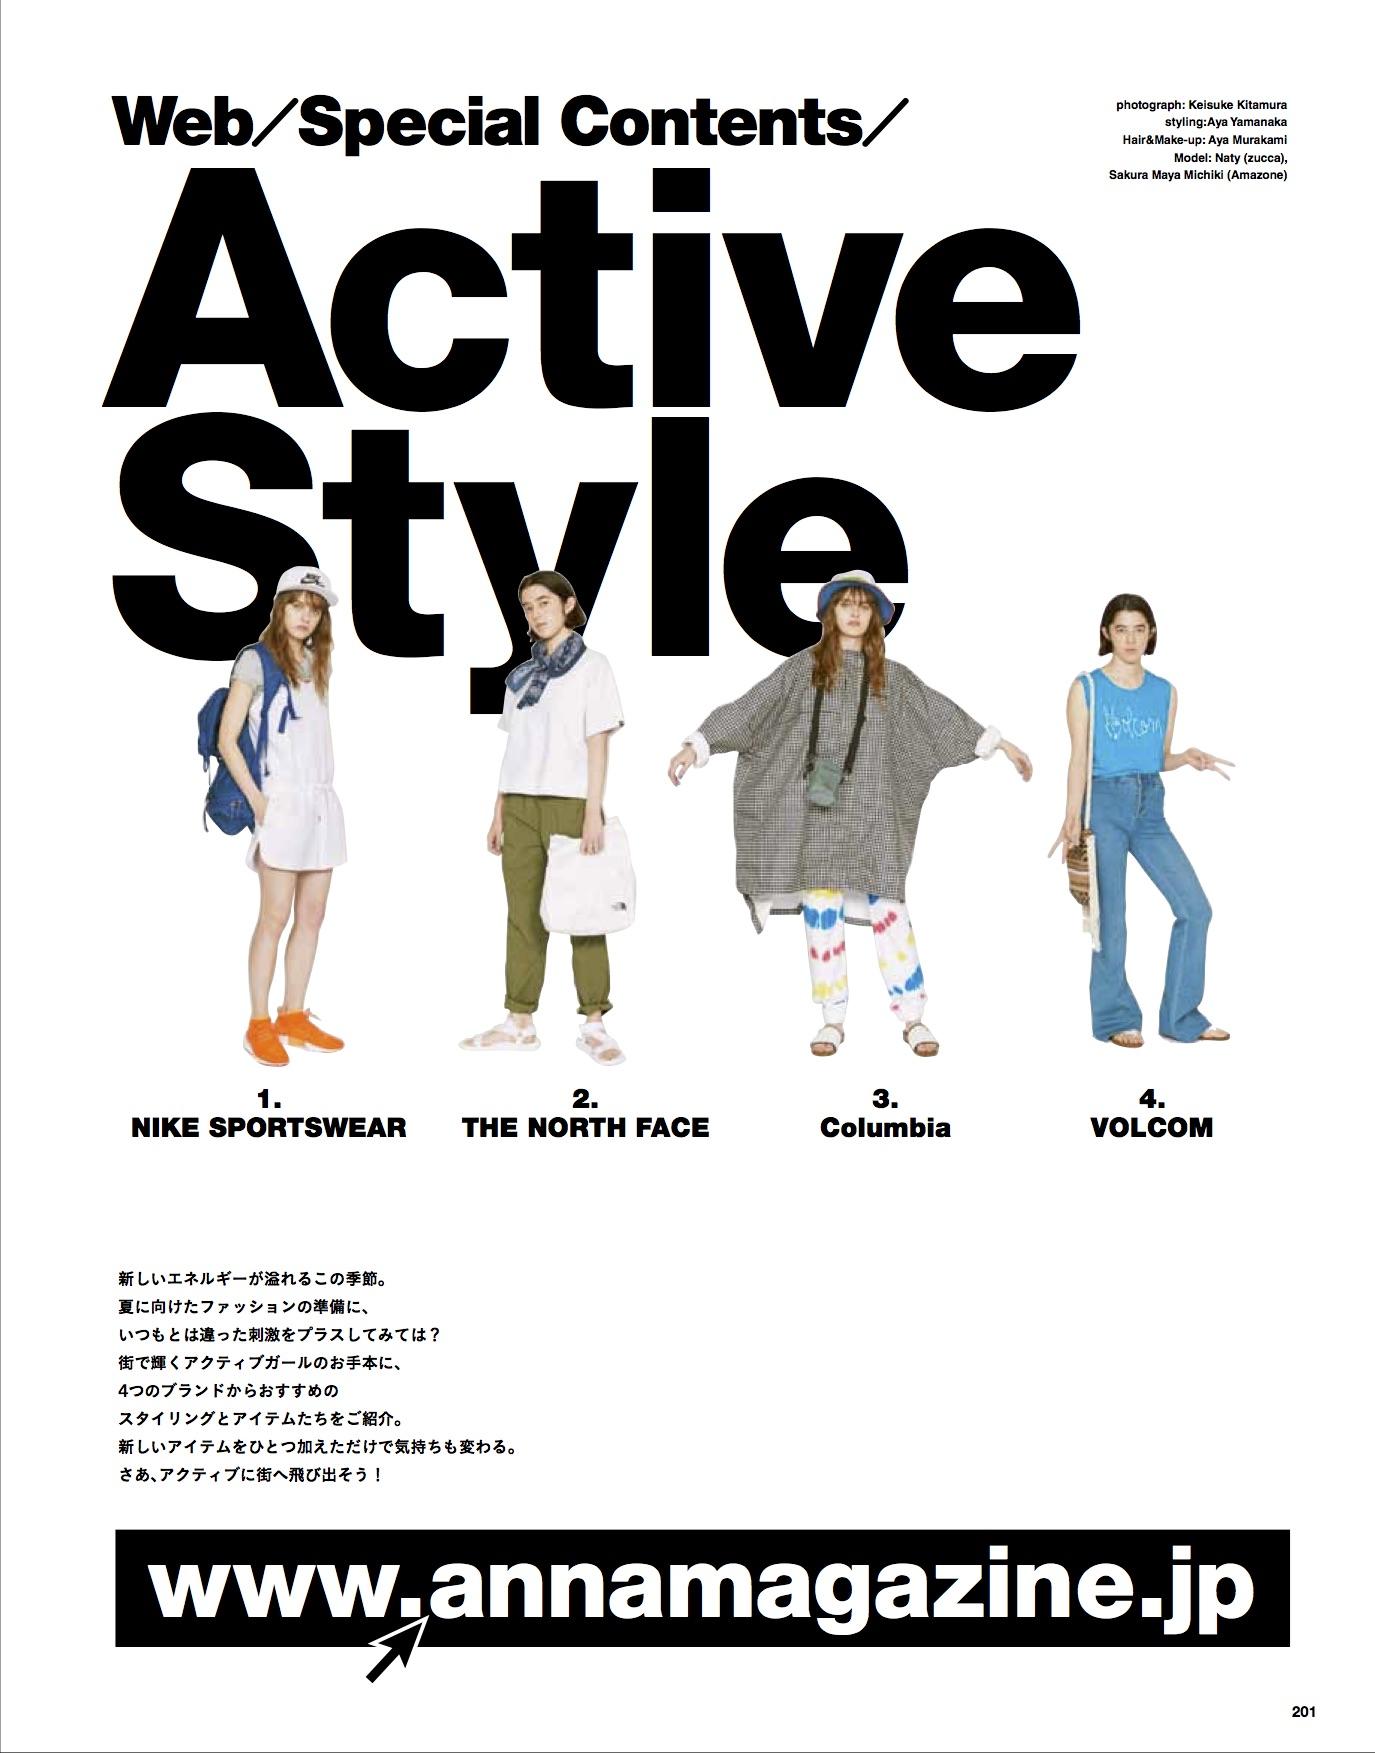 anna magazine vol.8 P101